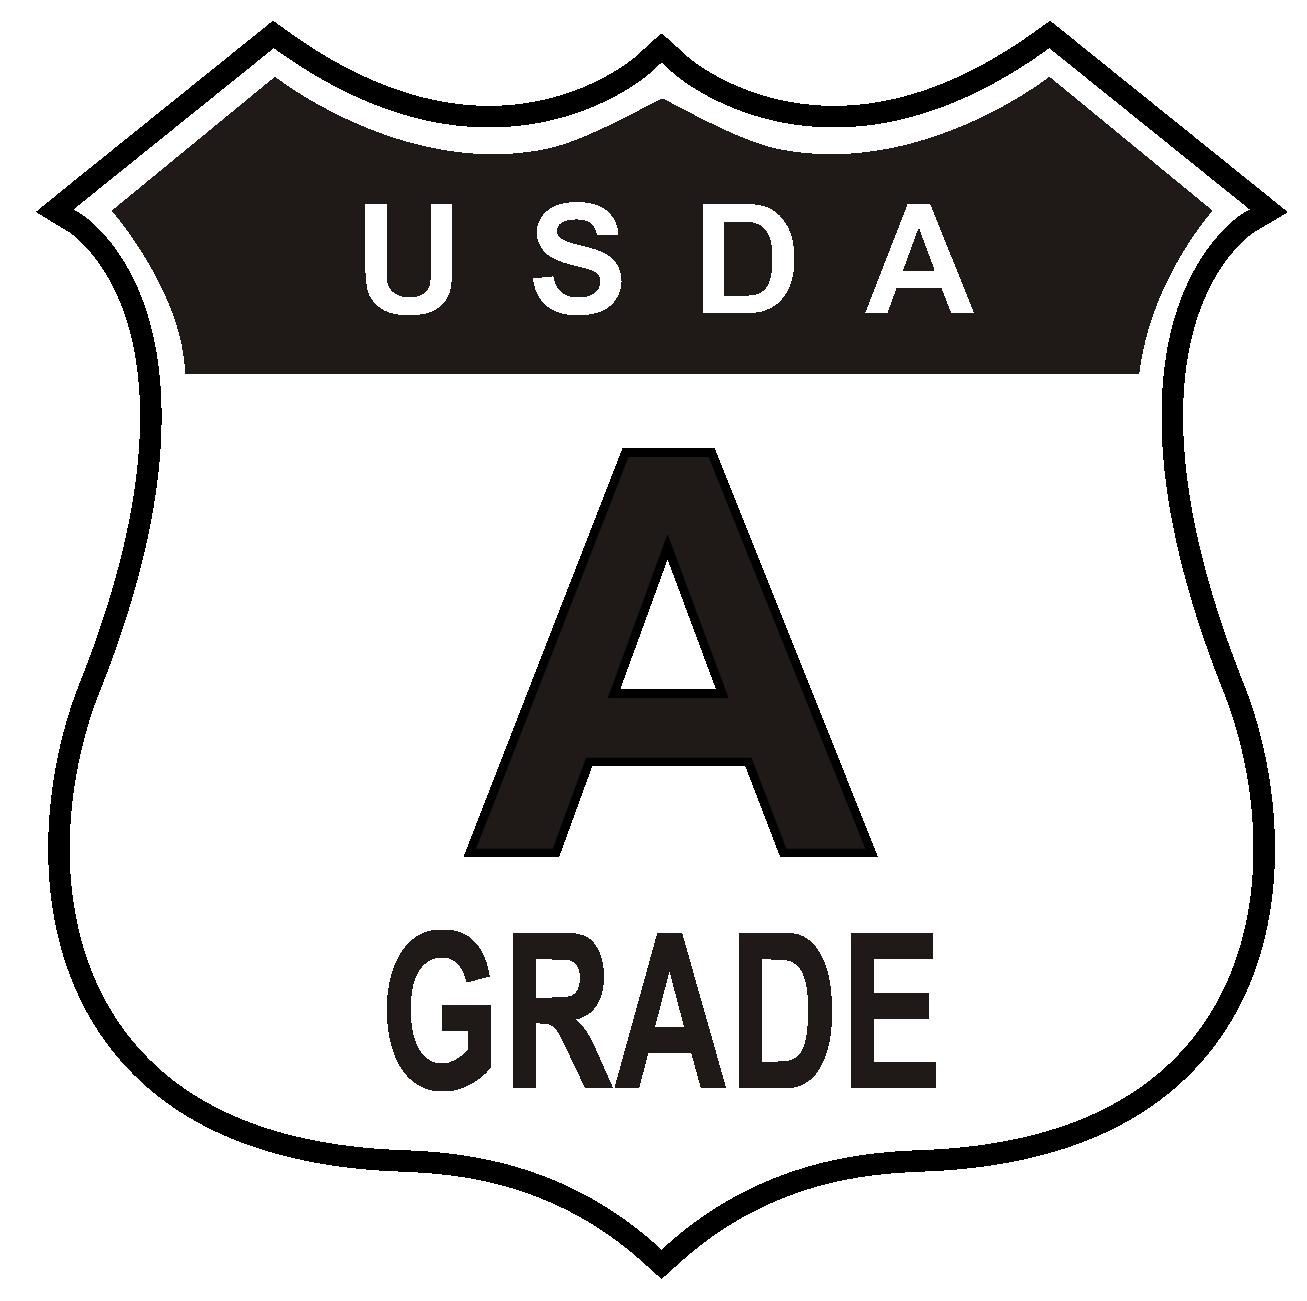 Grades clipart graded work. Egg grading shields agricultural